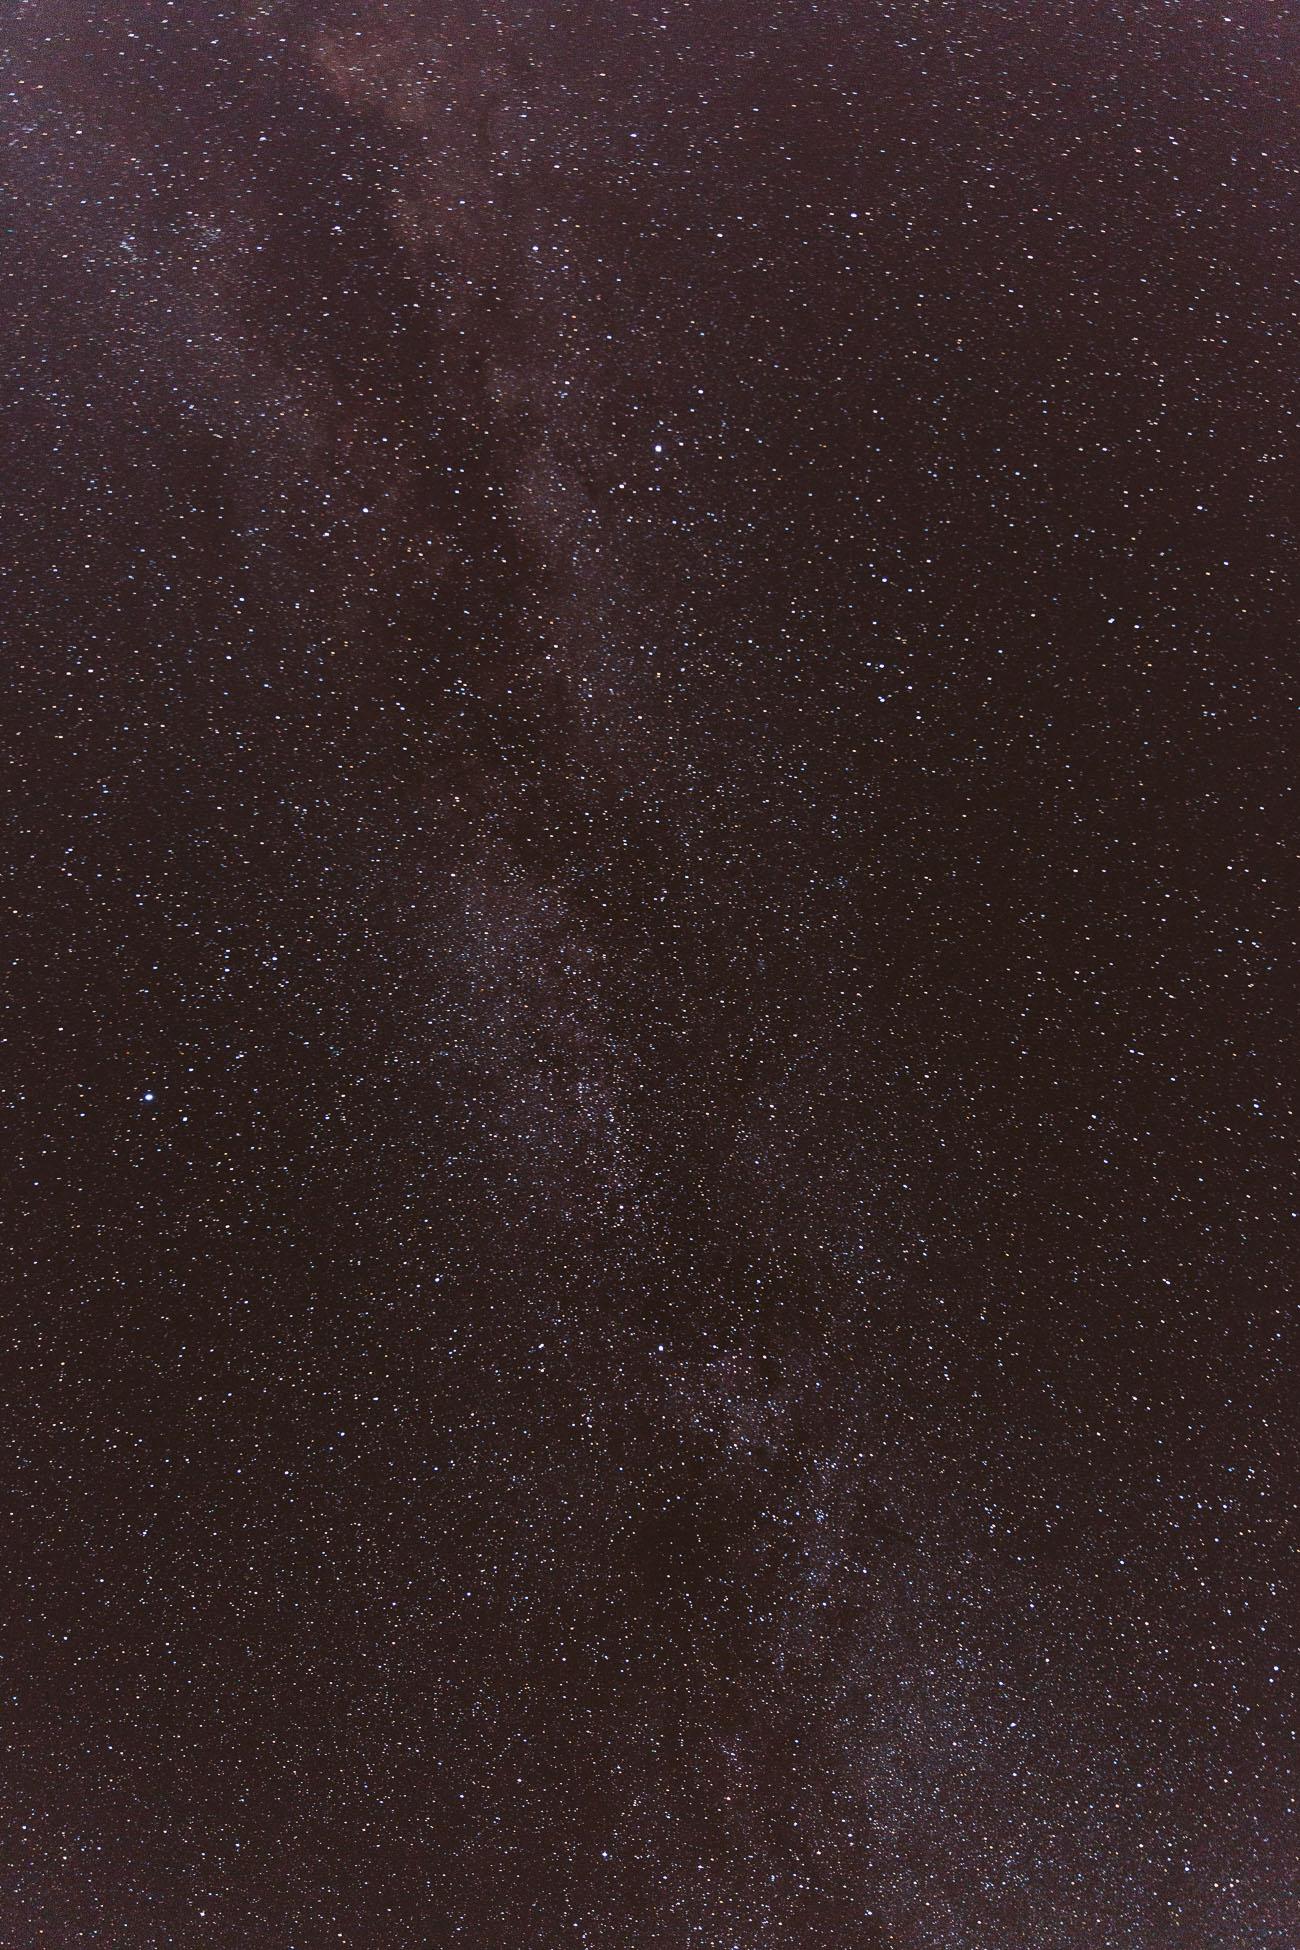 Star gazing in Tenerife